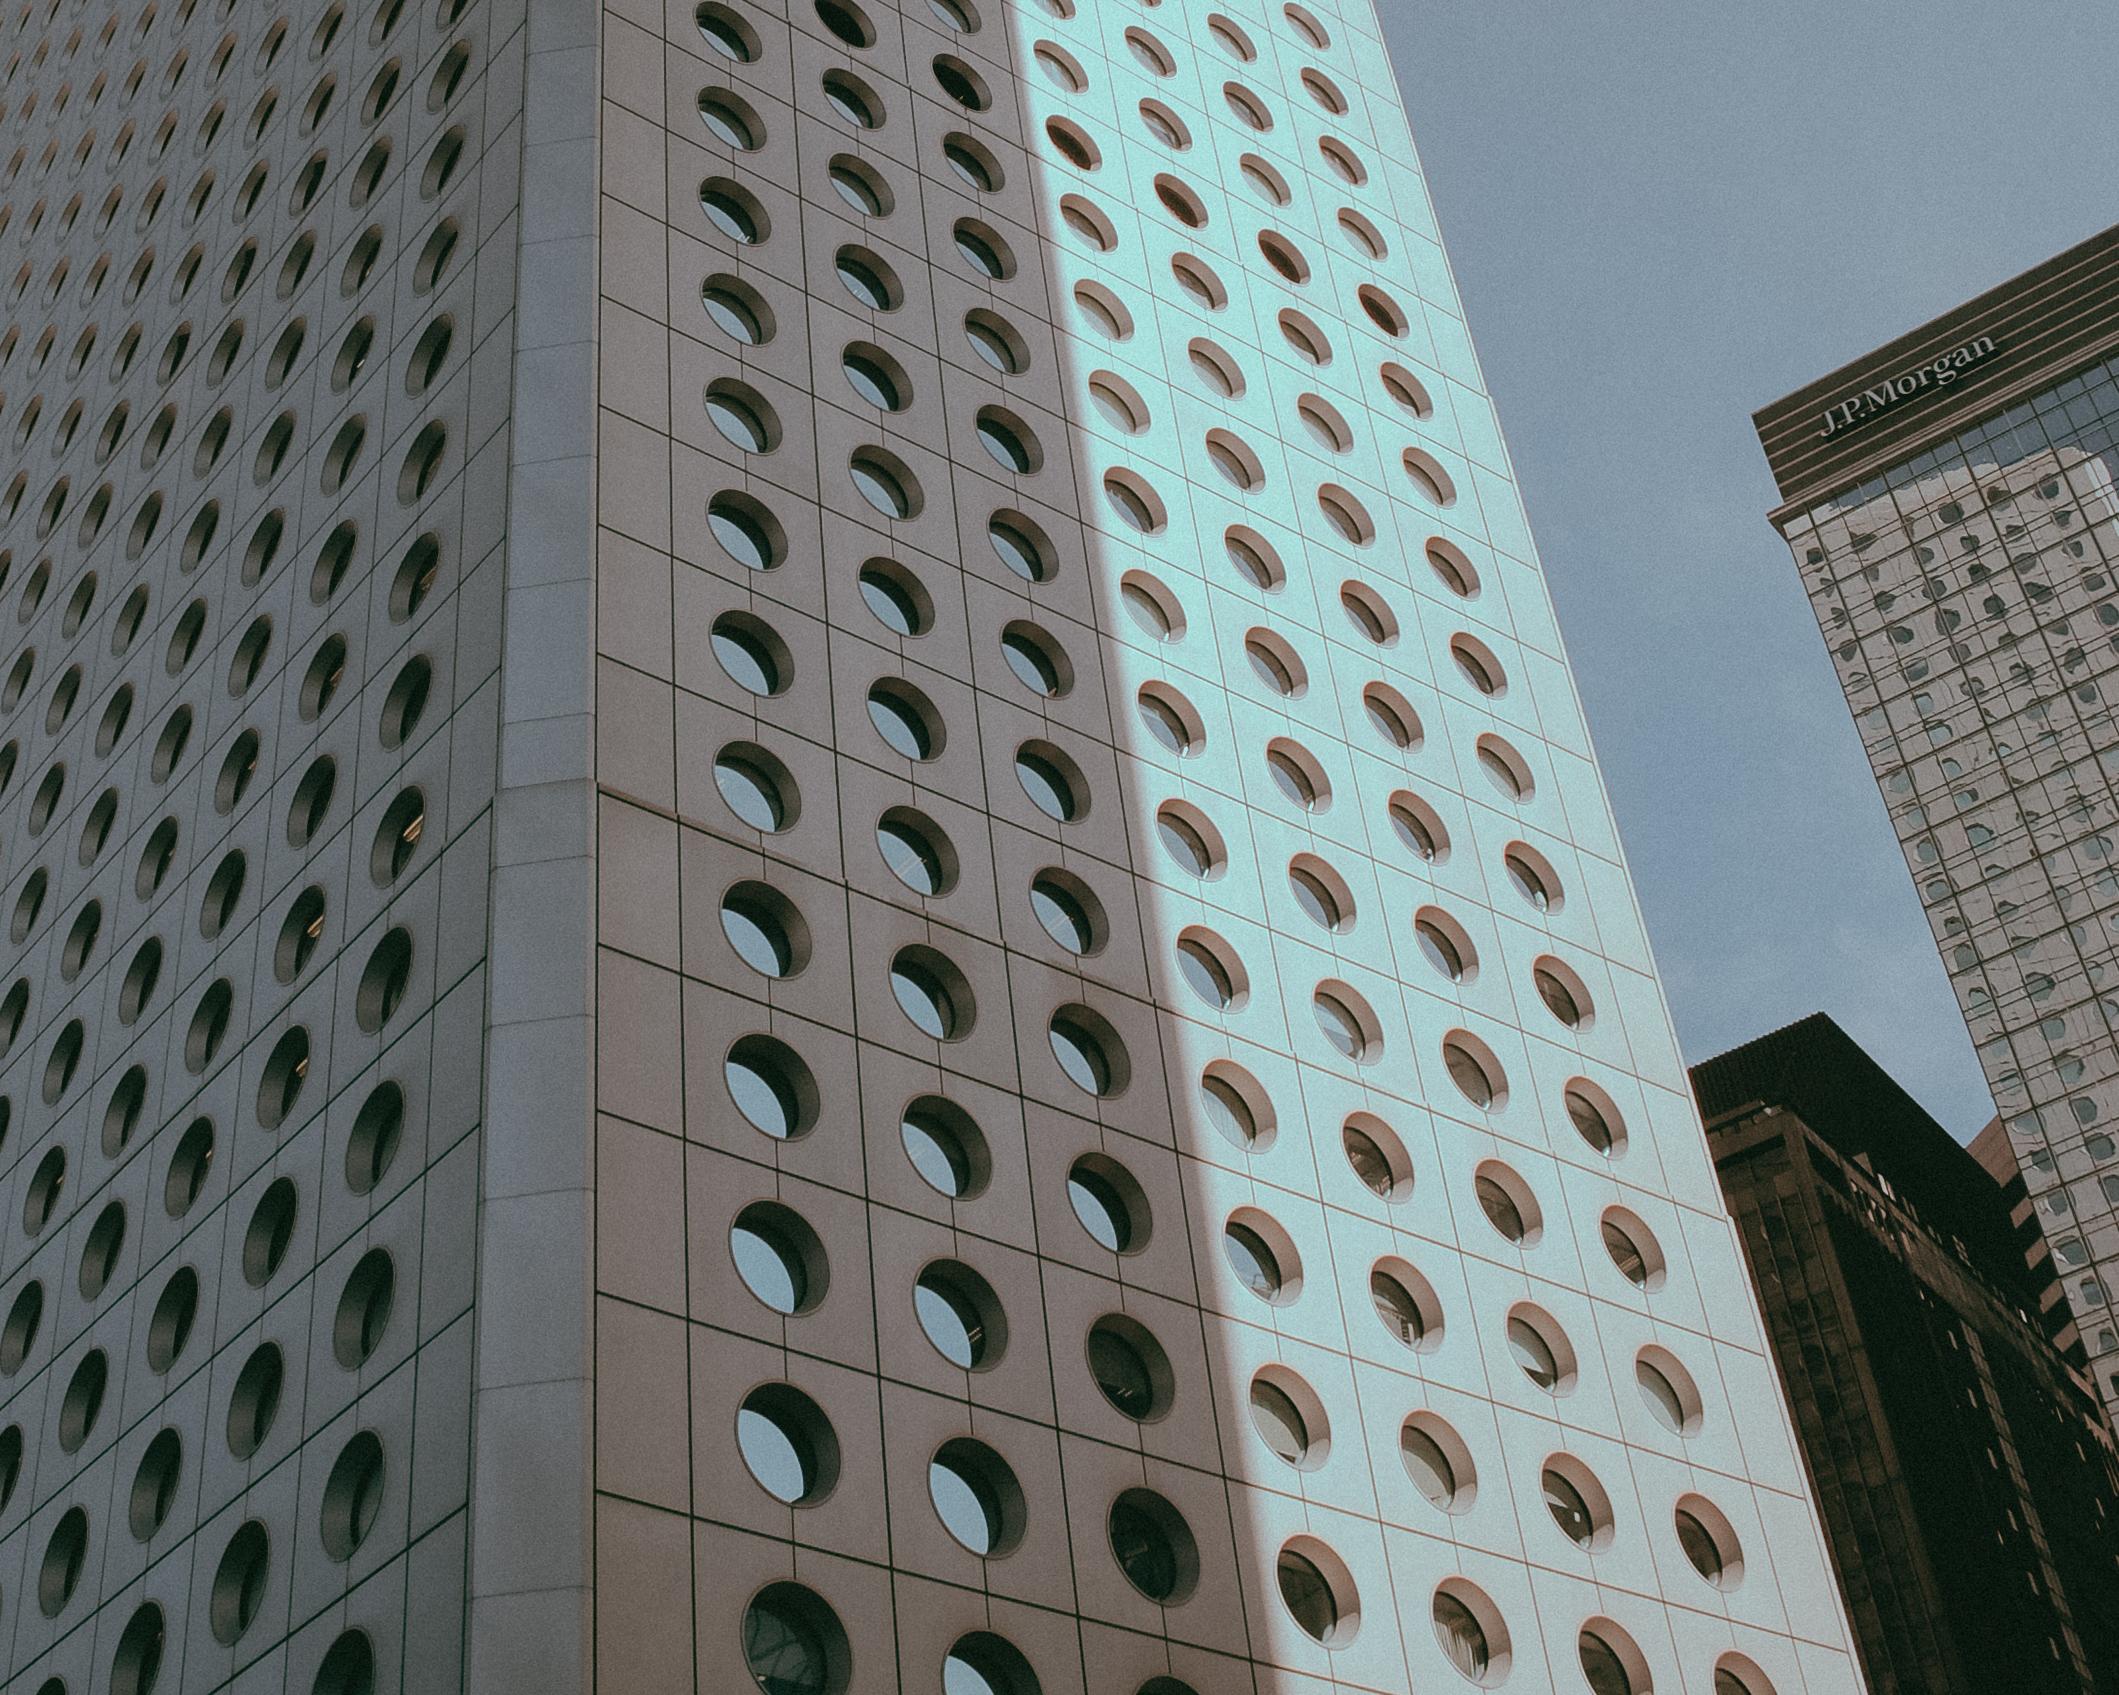 jonathan-burkhart-photographer-oklahoma-city-hongkong-china-1134.jpg